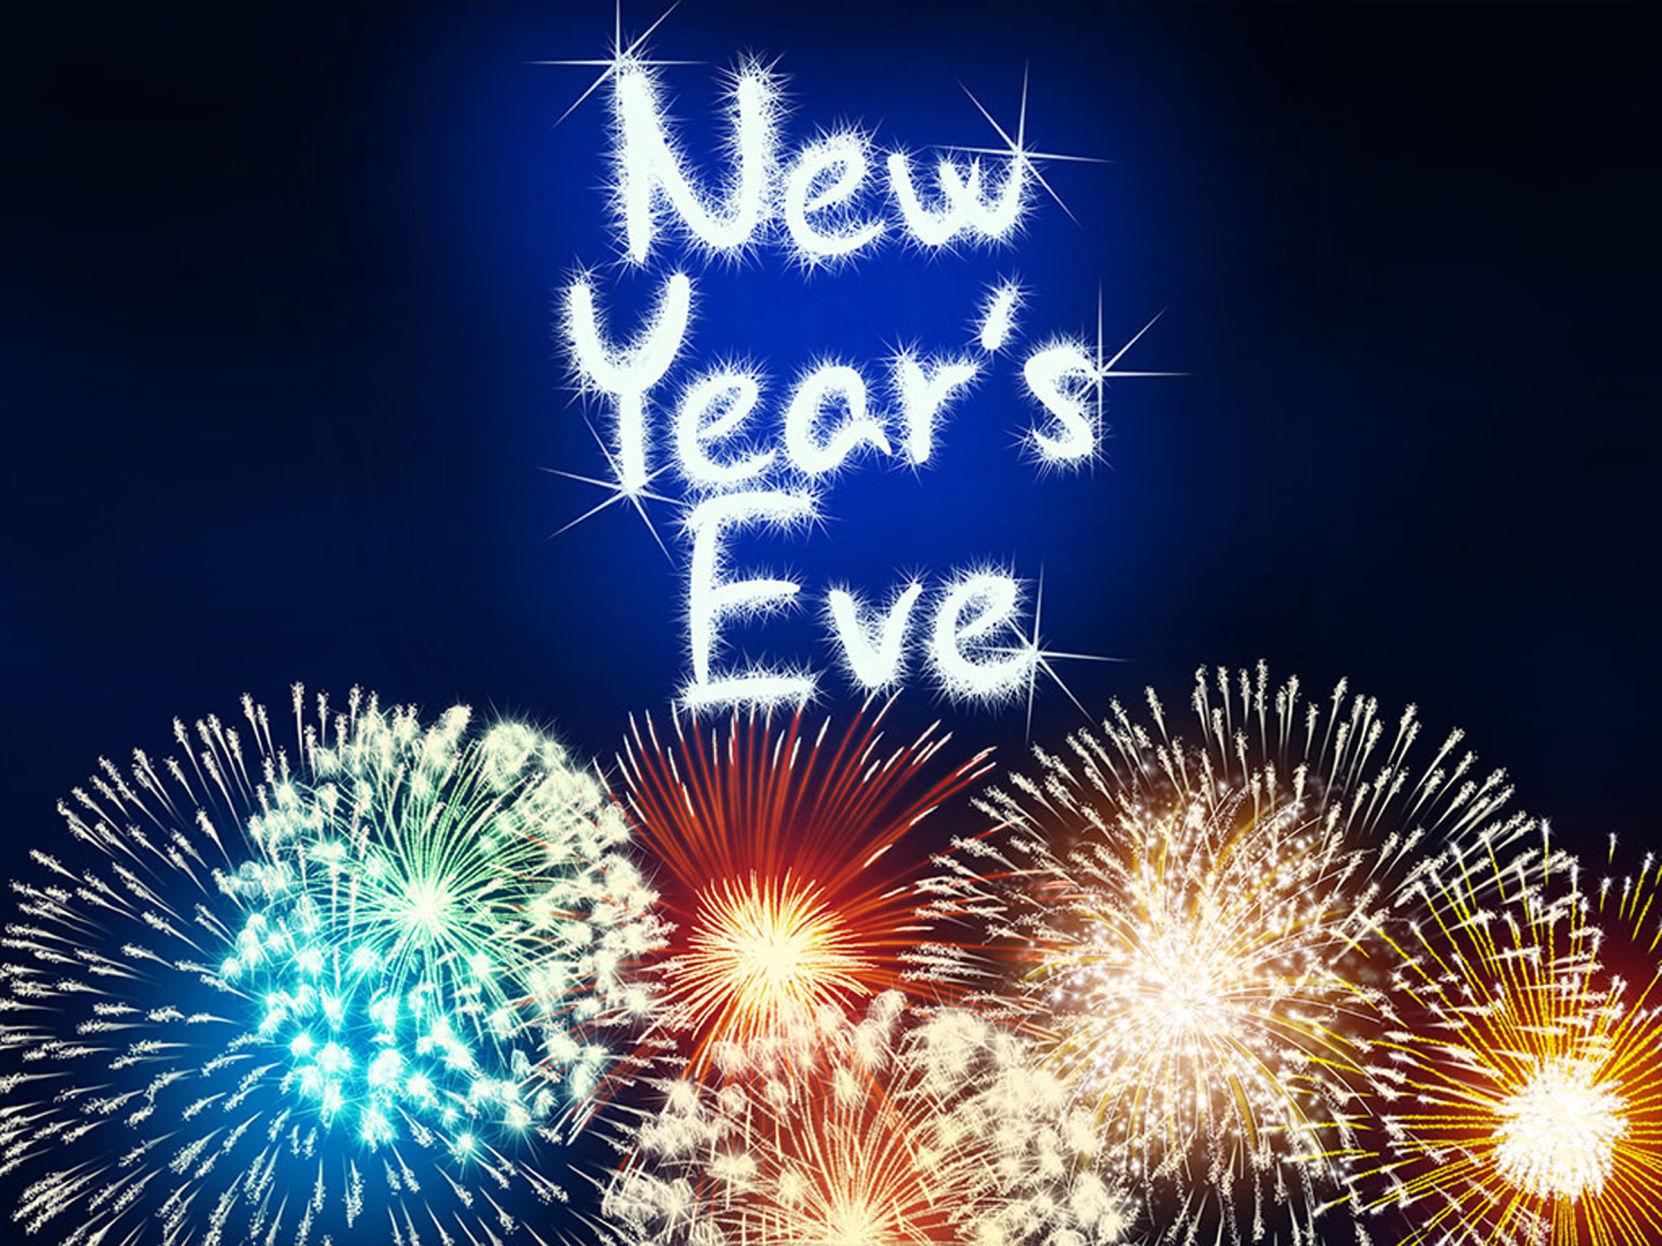 New Year S Eve Celebrations In The Kenosha Area Events